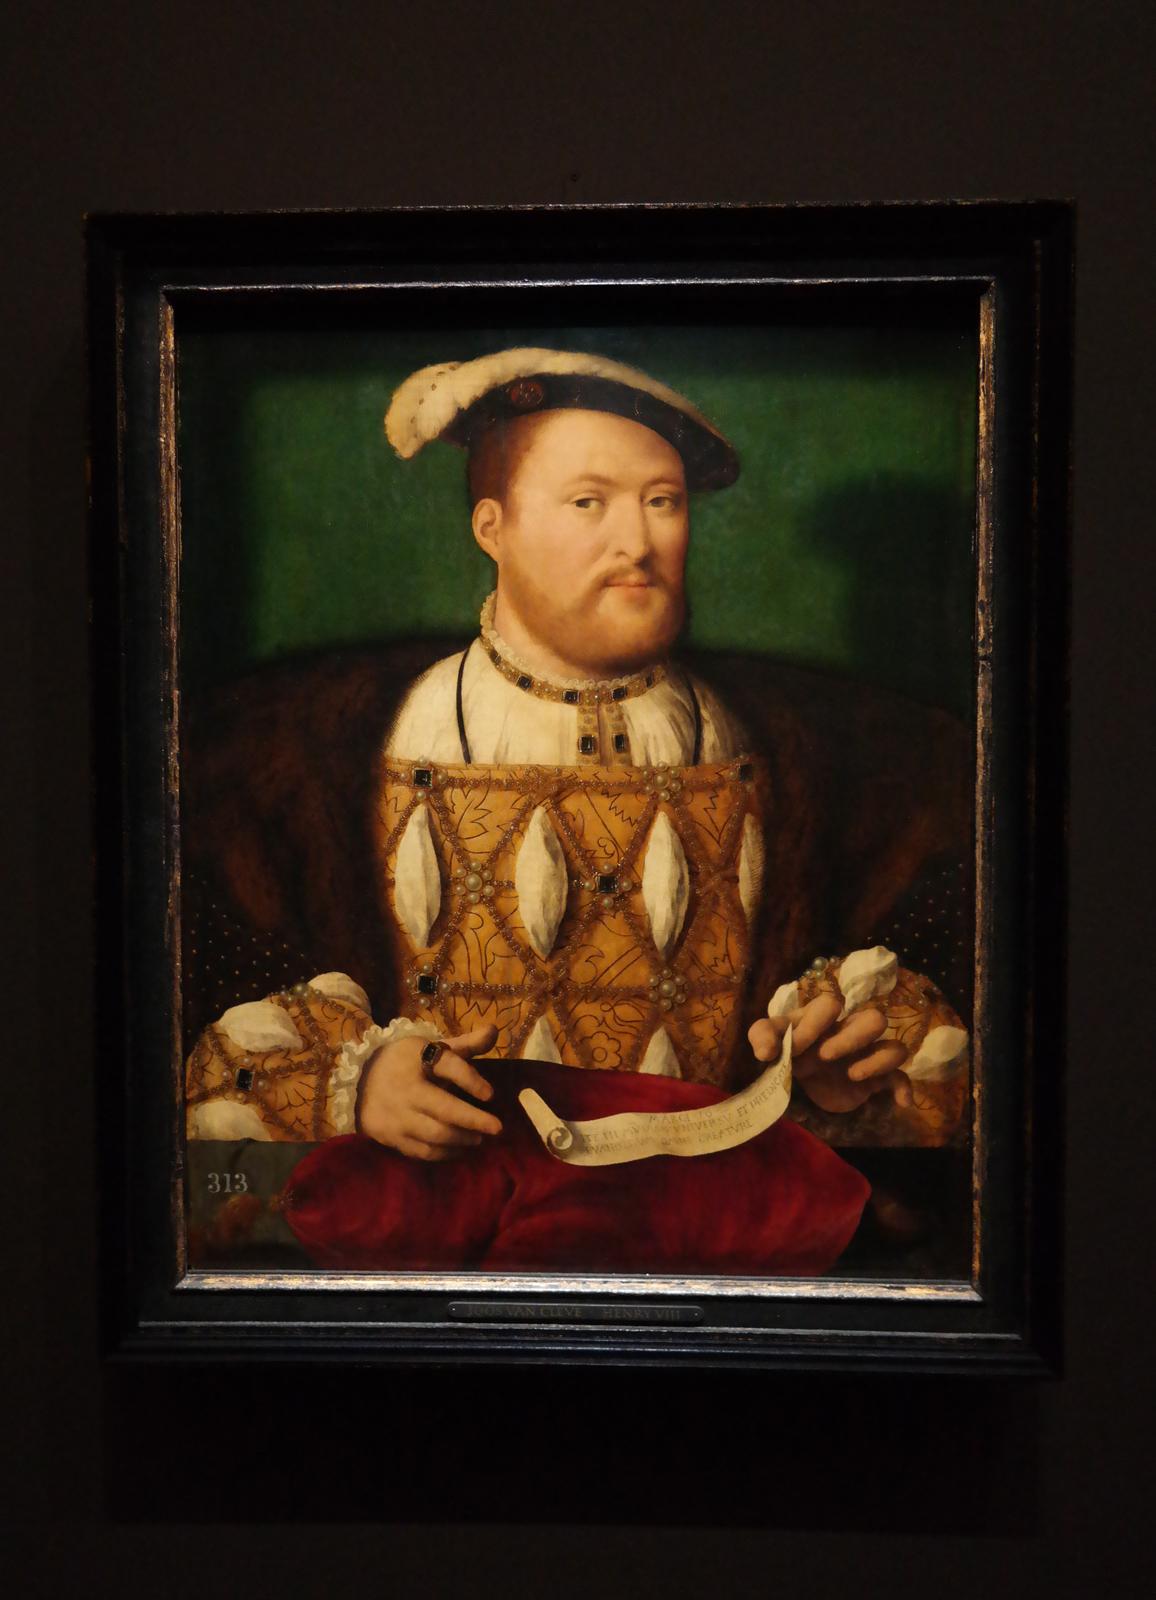 Henri VIII - Joos Van Cleve - vers 1530-1535